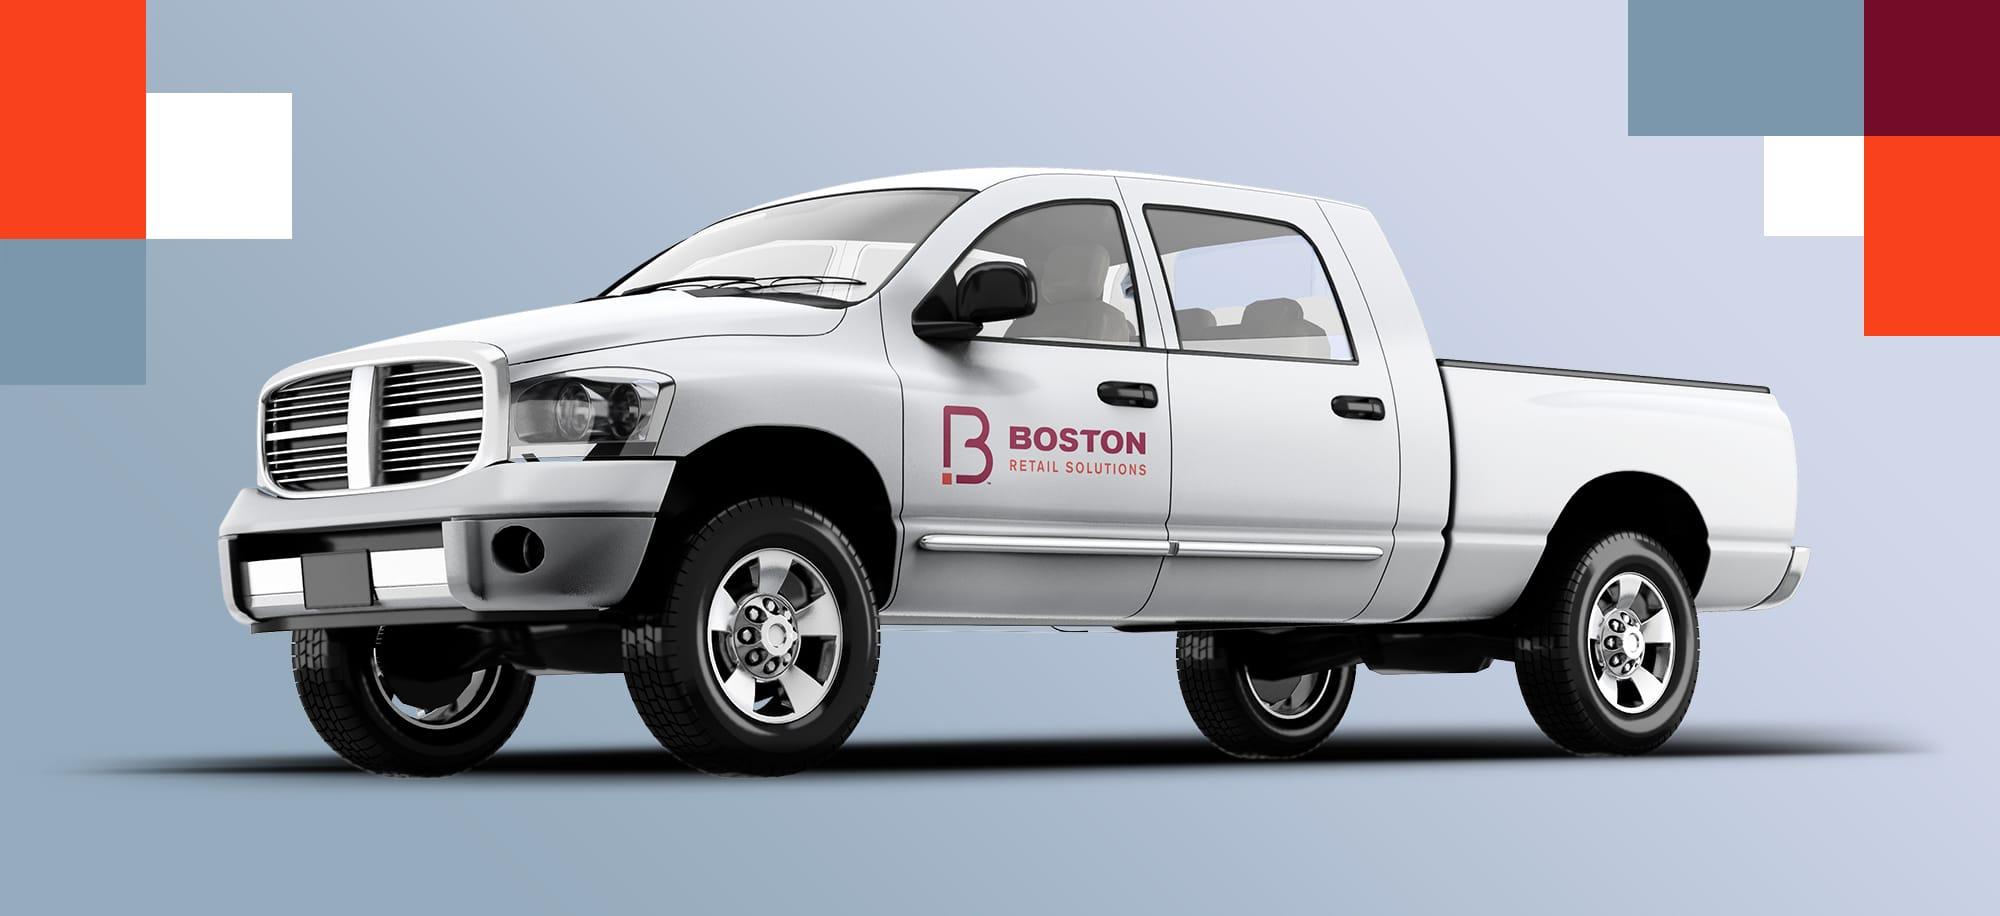 Boston Retail Solutions Truck